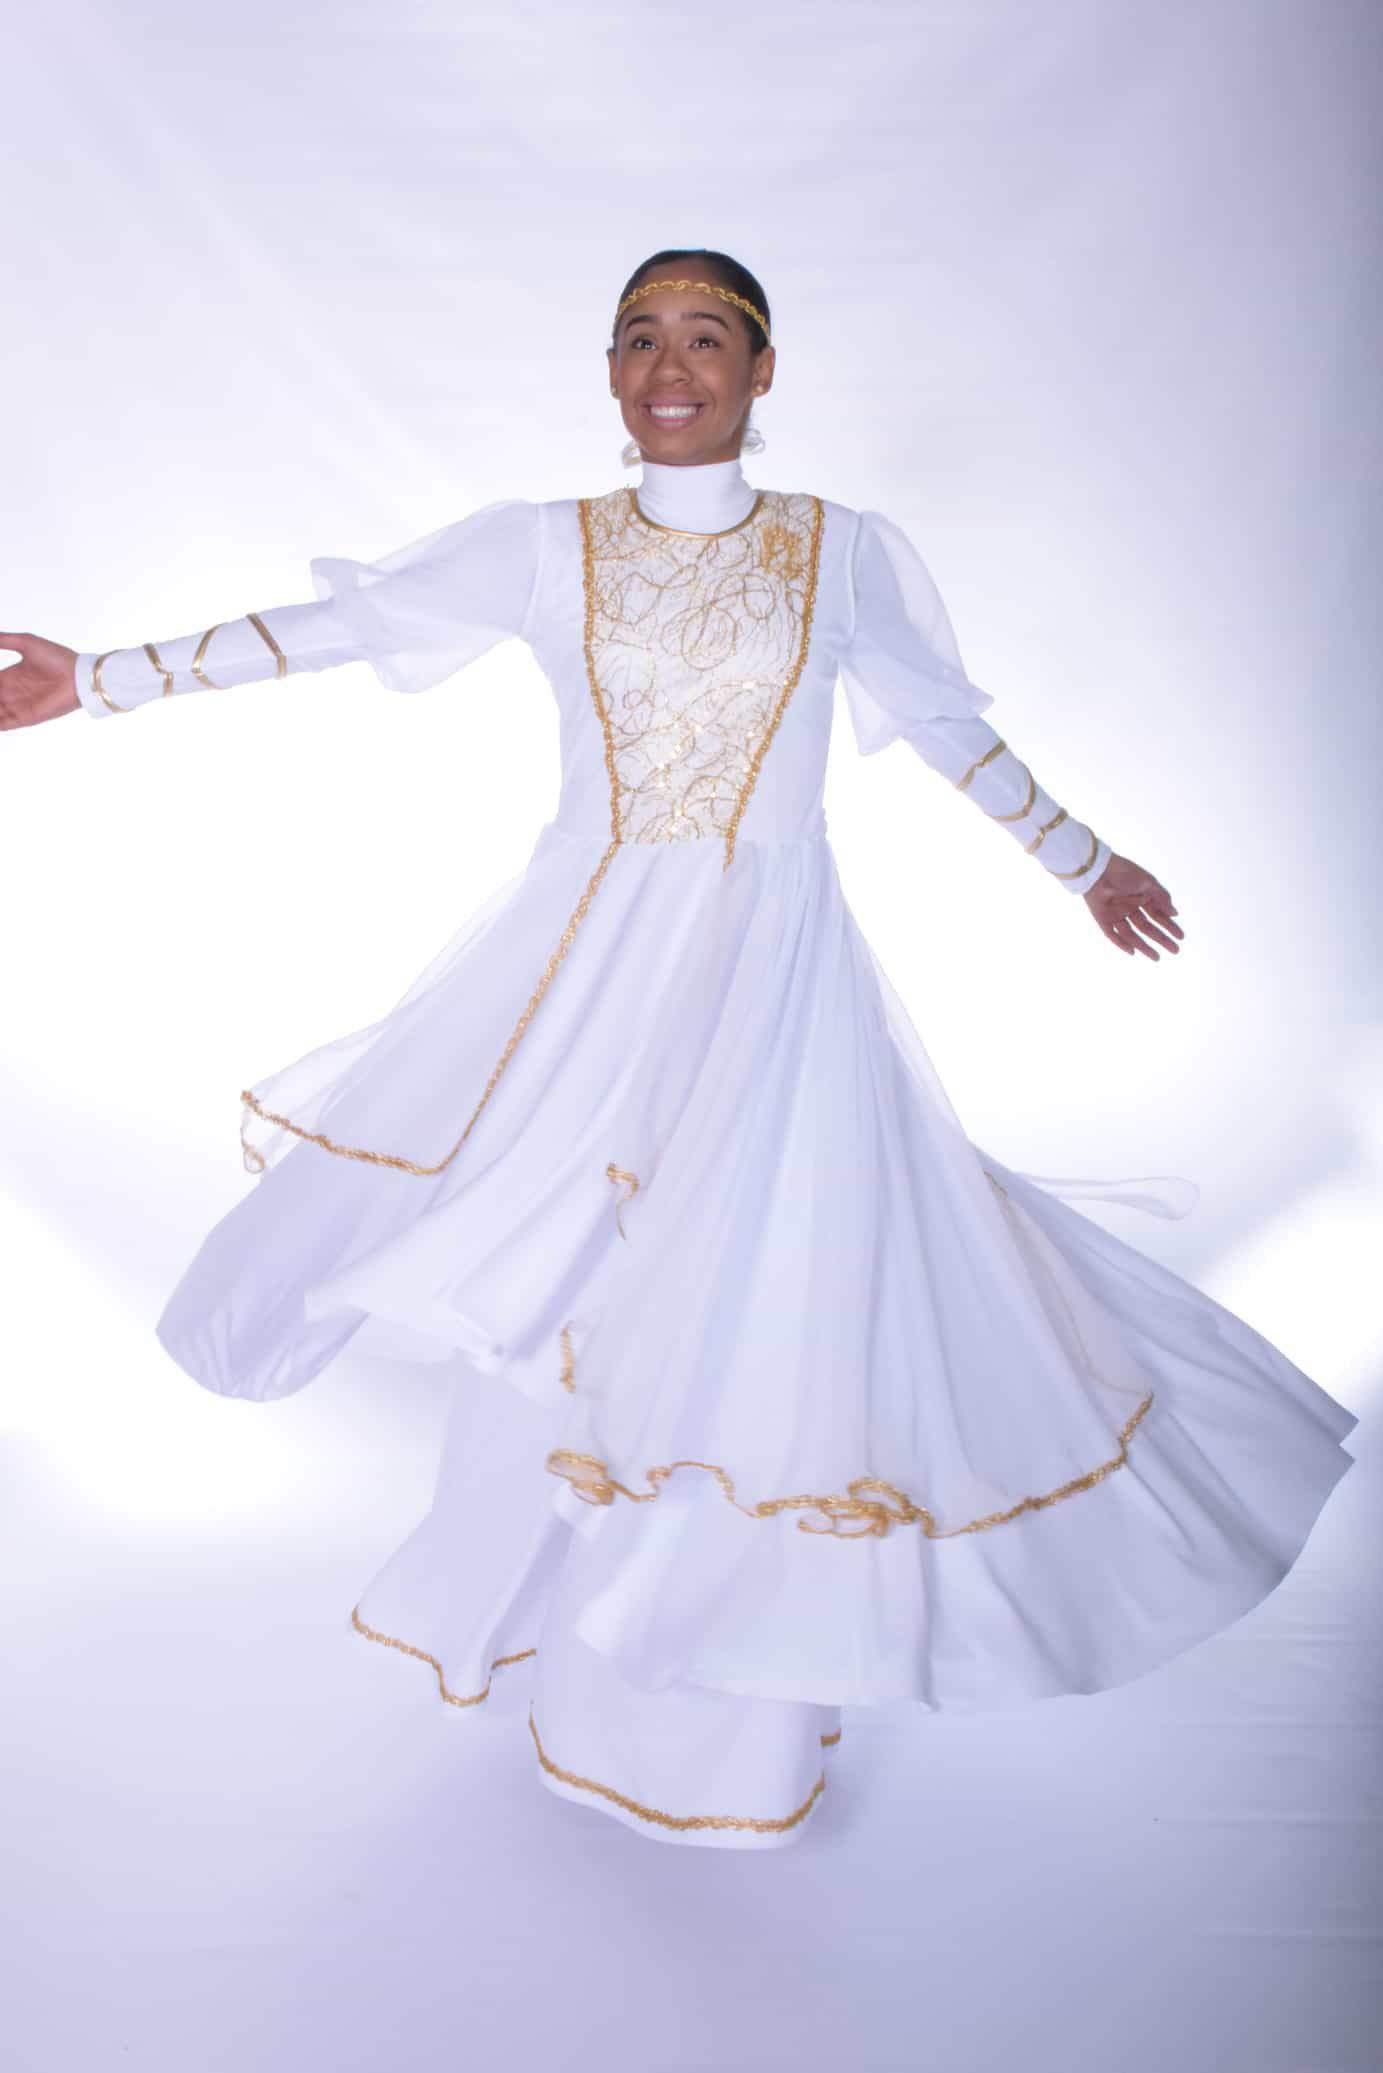 6a67330bfabb The Bride Cascade Tunic (White/Gold)